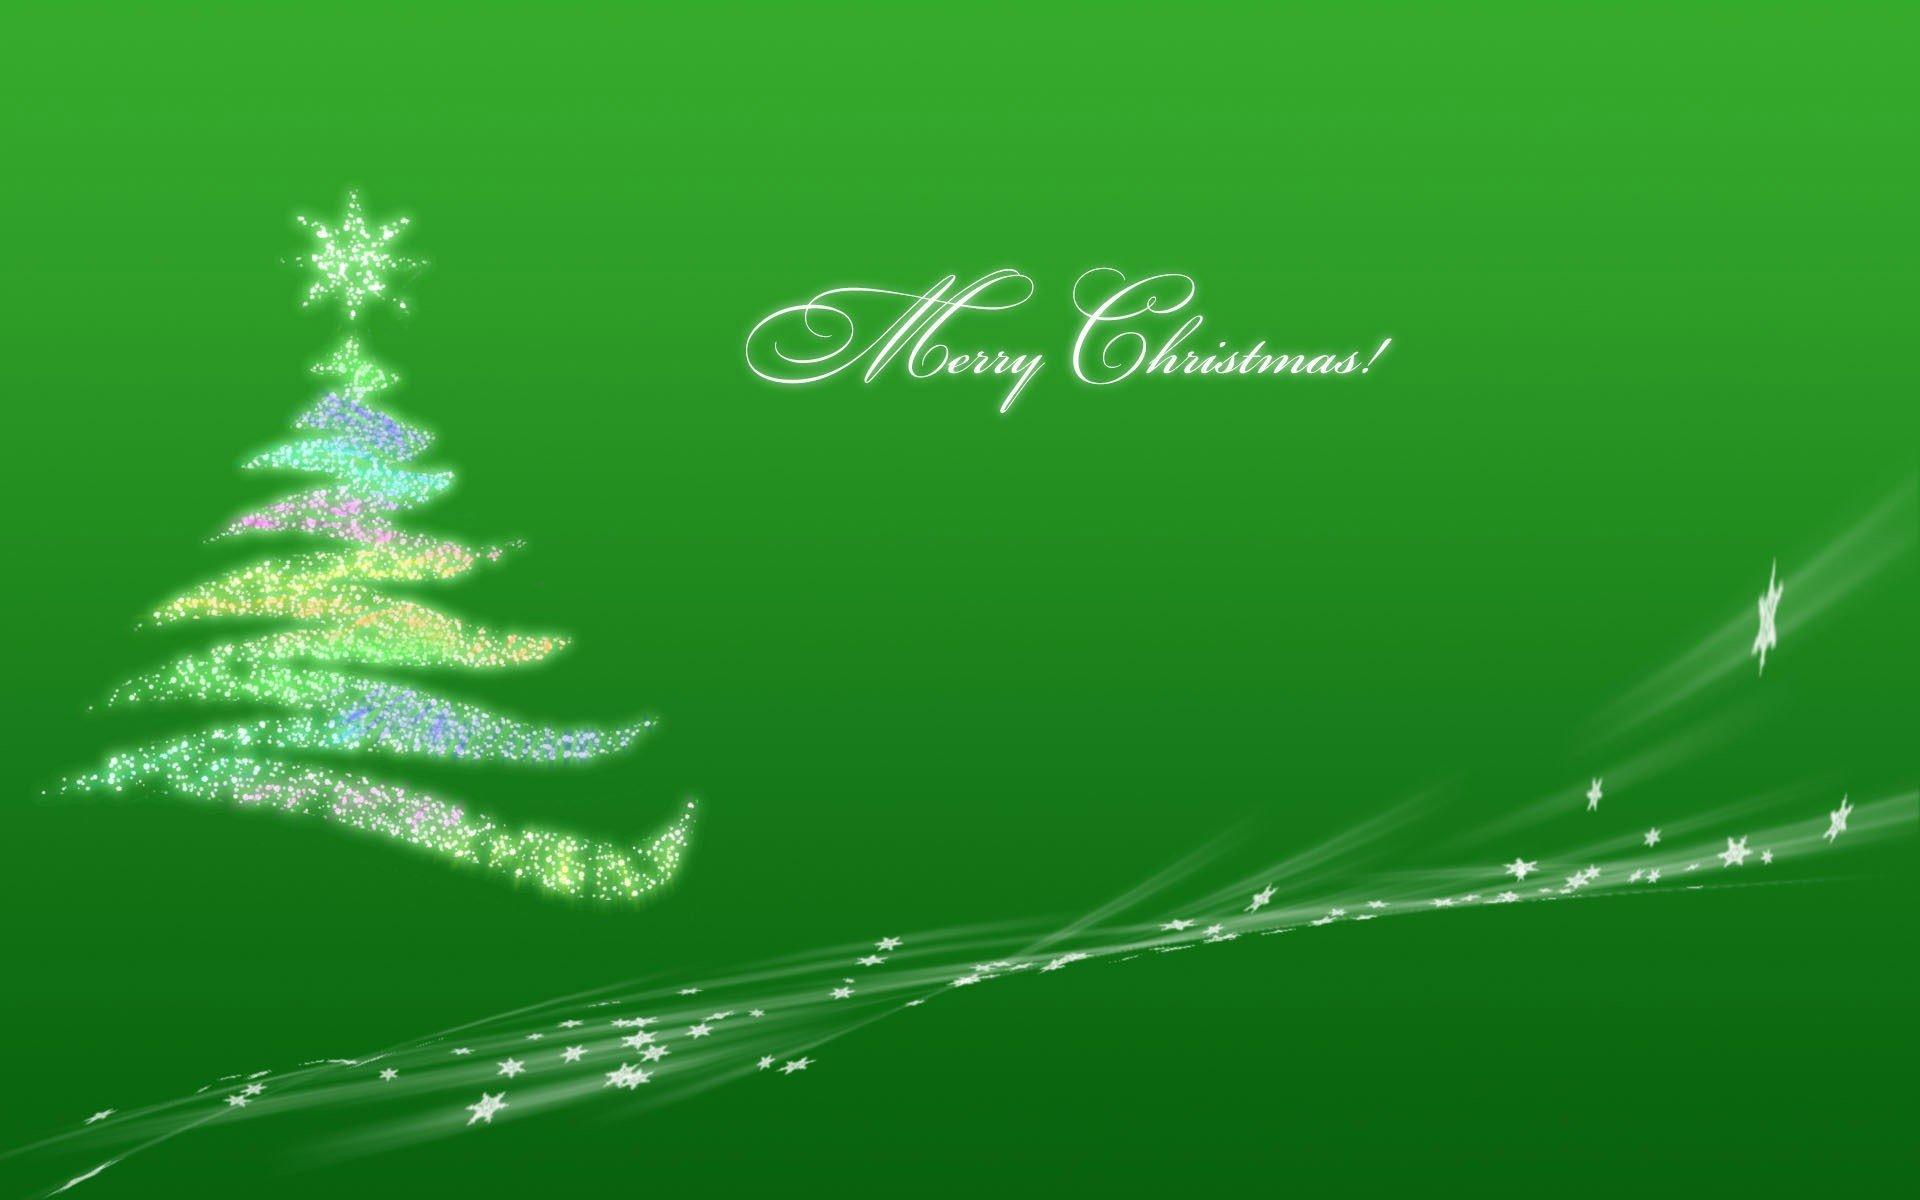 2560x1440 Wallpaper Cars Green Nature Christmas Christmas Trees Simple